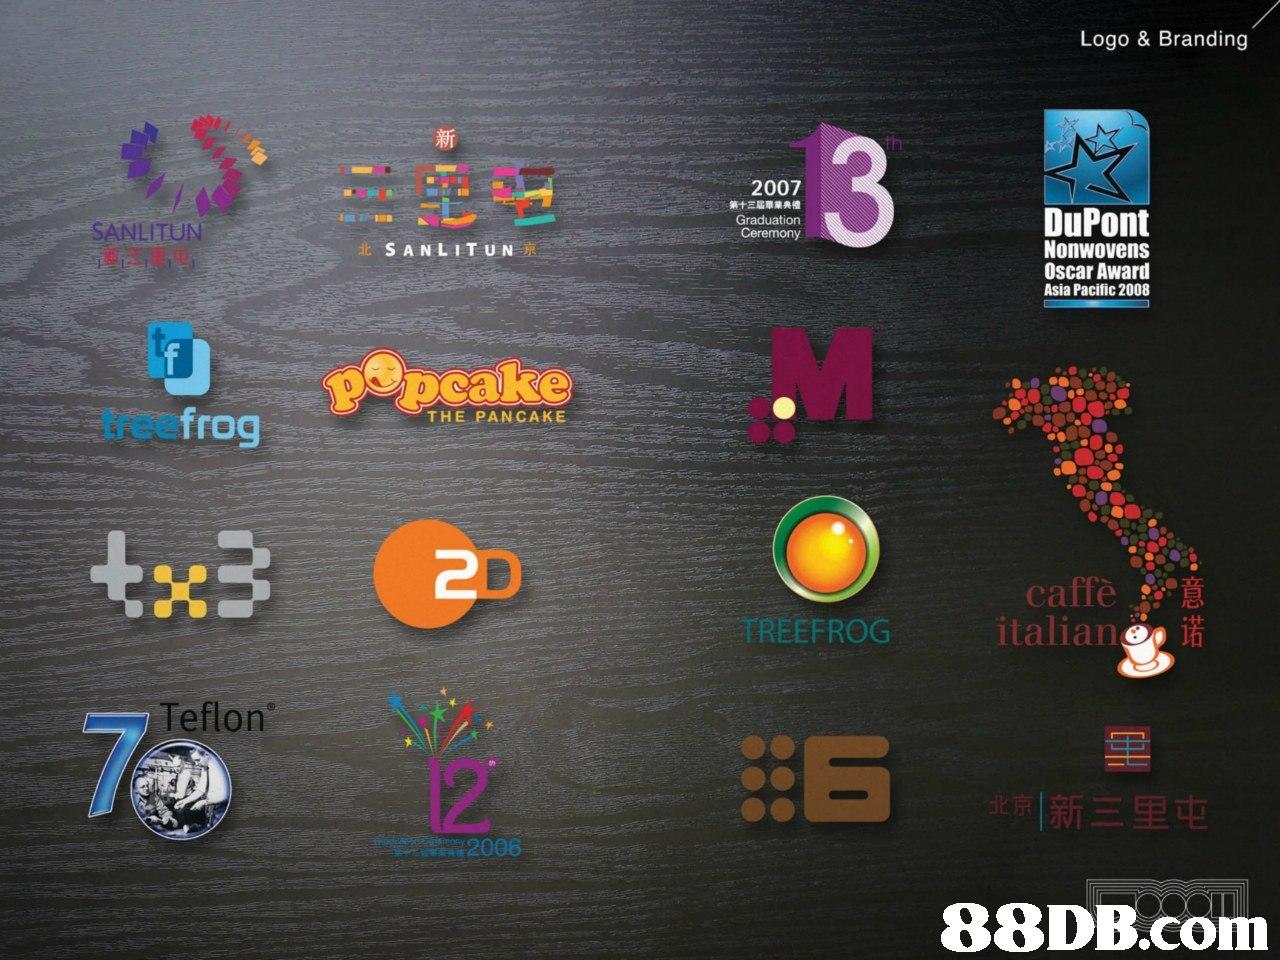 Logo & Branding 2007 第十三屆畢業典禮 Graduation SANLITUN DuPont Nonwovens Oscar Award Asia Pacific 2008 treefrog THE PANCAKE italia! + TREEFROG Teflon 京|新三里屯 2006   Text,Font,Screenshot,Technology,Icon